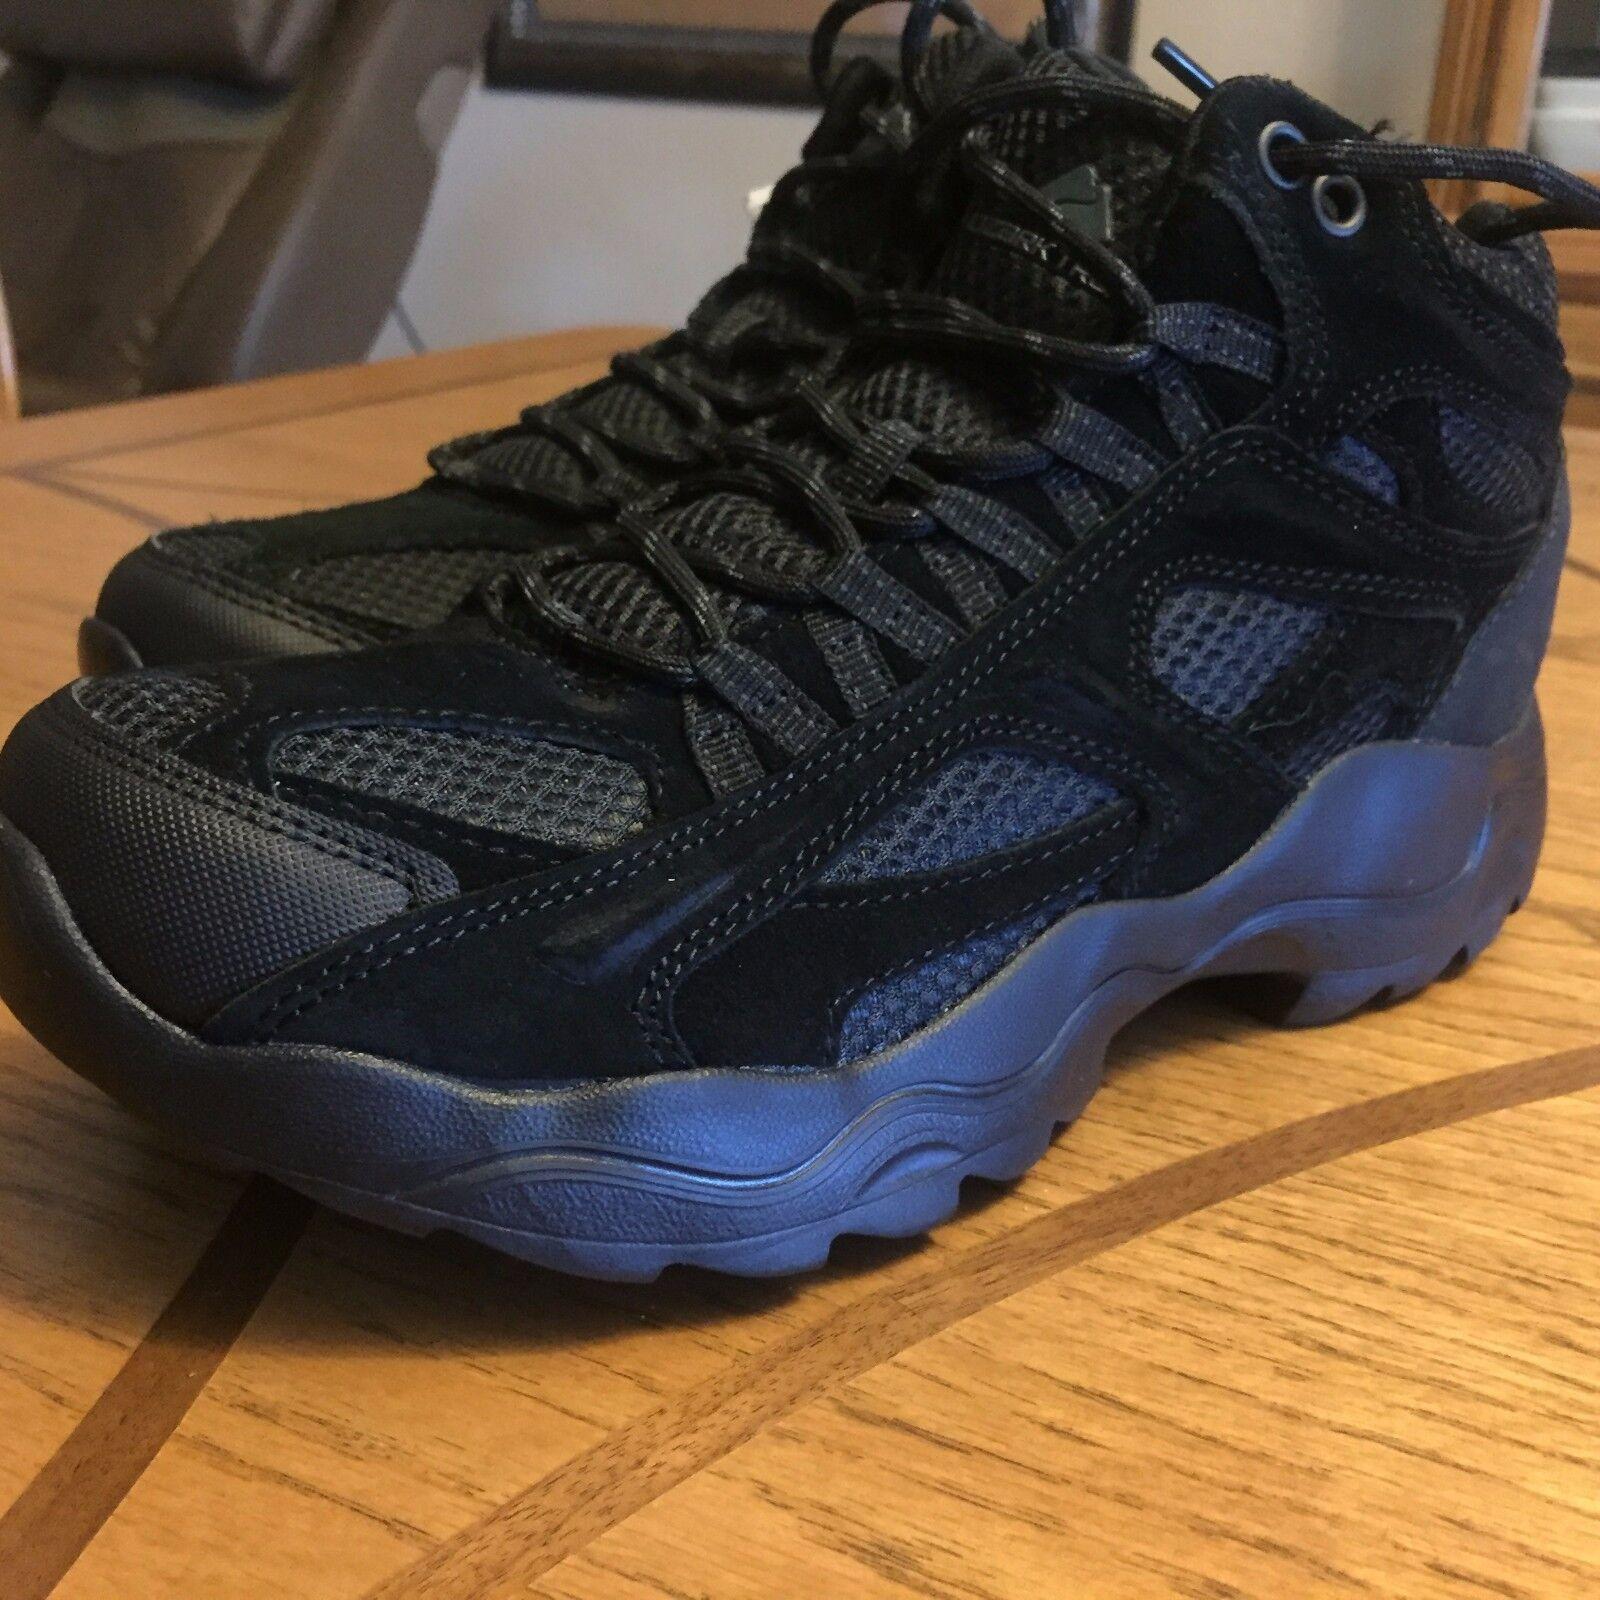 04d146dd078 Купить Ozark Trail Men's Sport Hiking Mid Boot Size: на eBay.com из ...